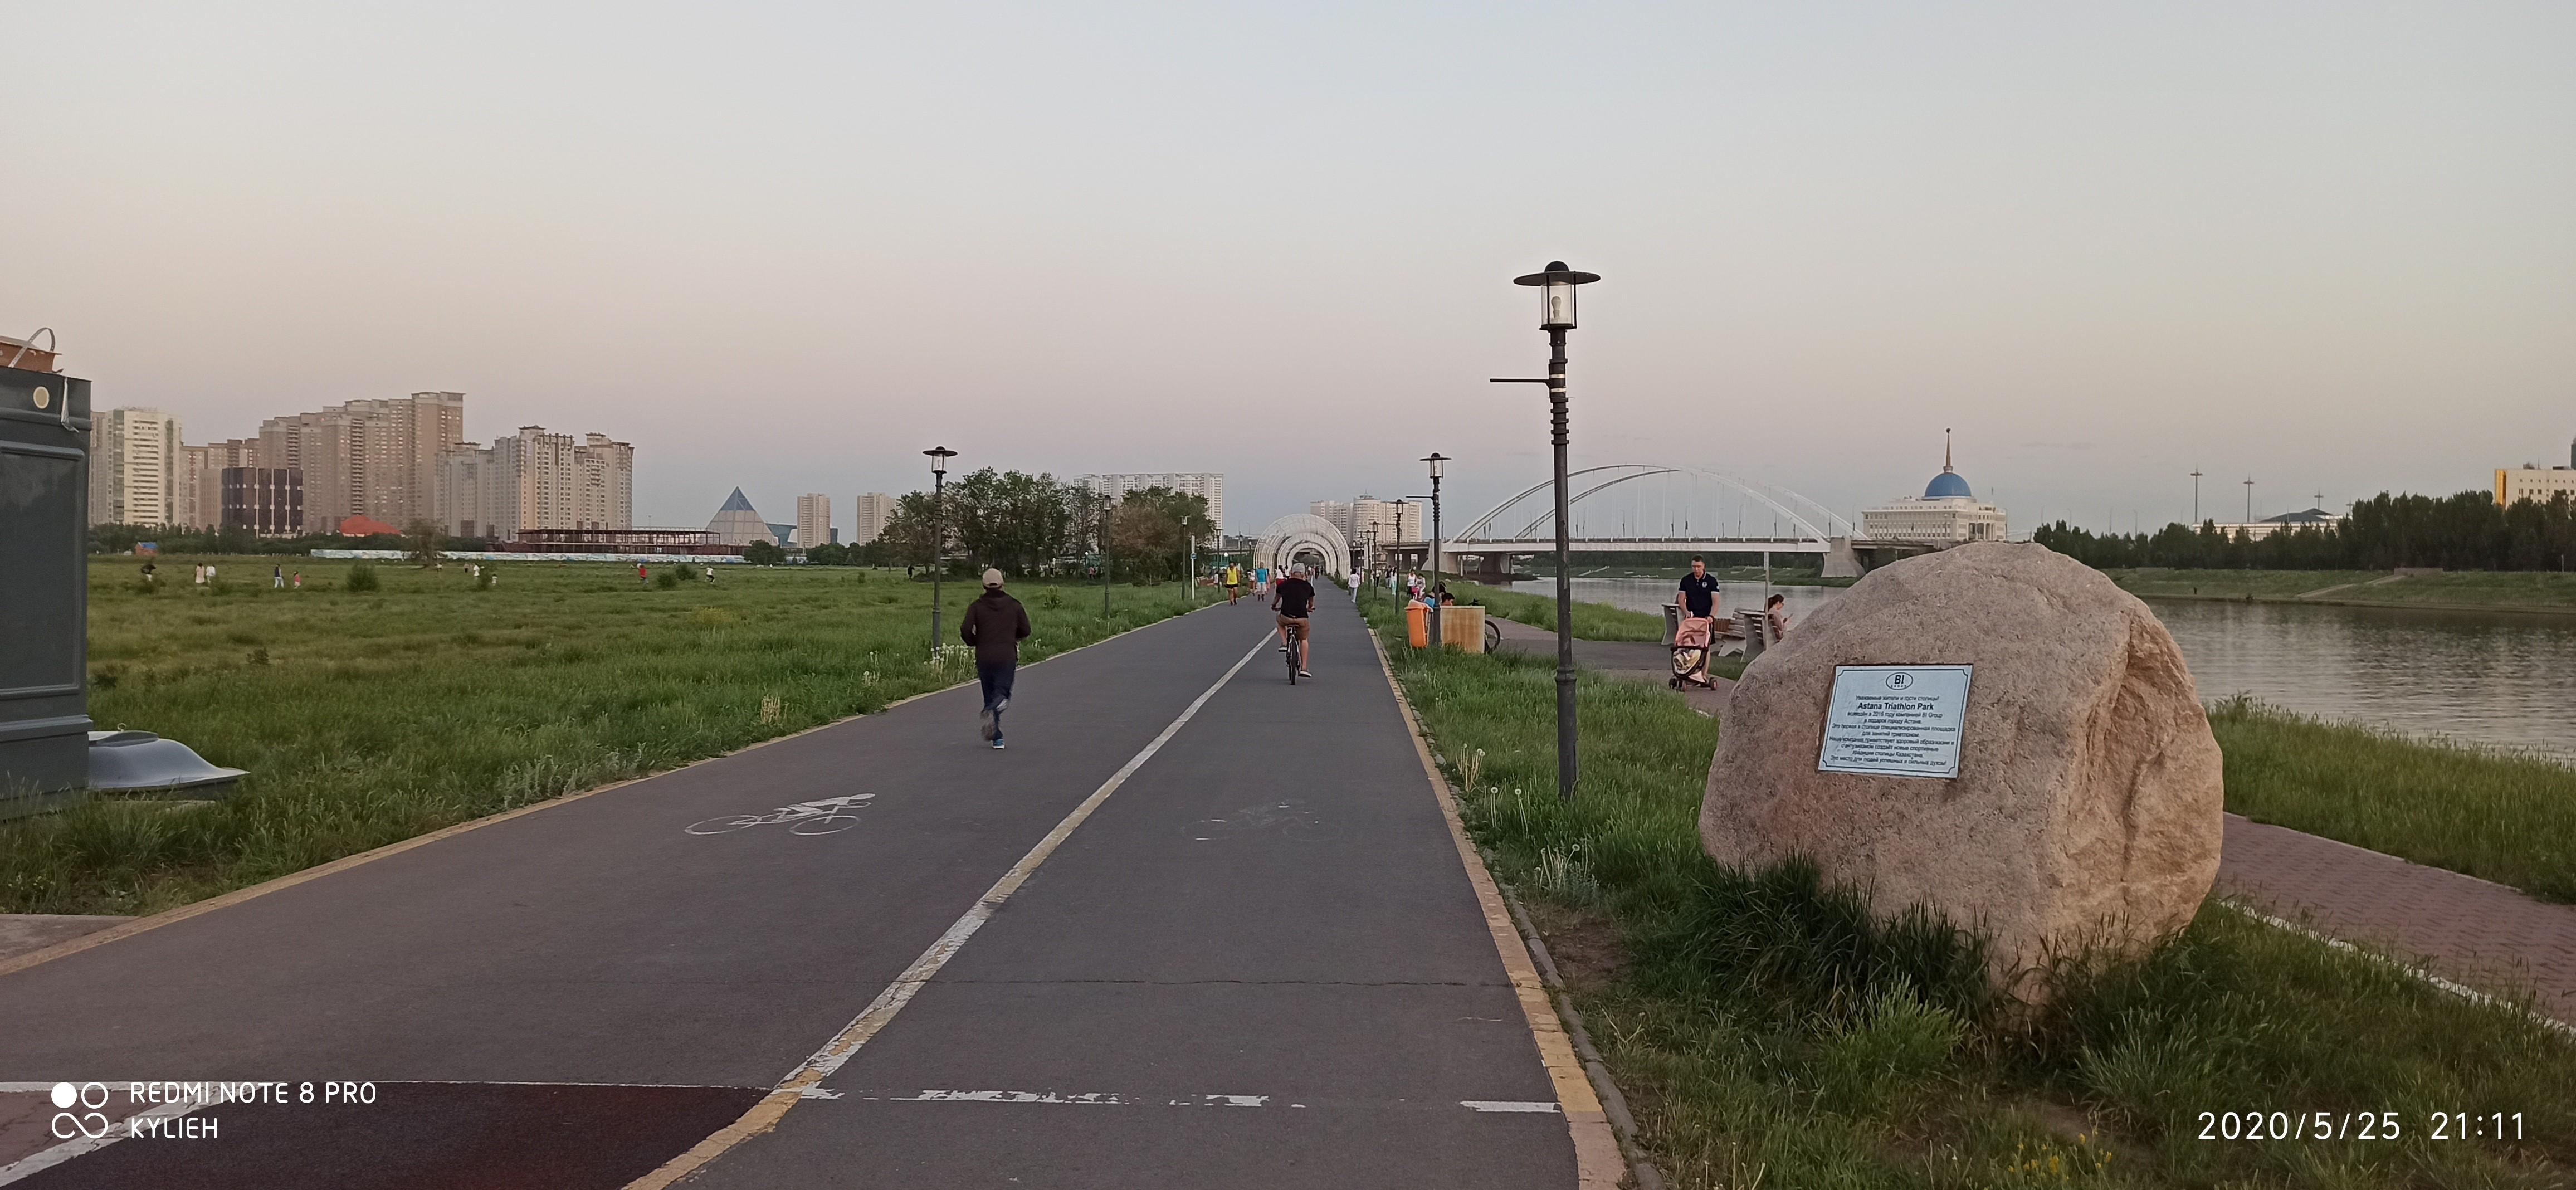 Велодорожка: триатлон парк, Велодорожки Астаны, Велодорожки Нур-султана